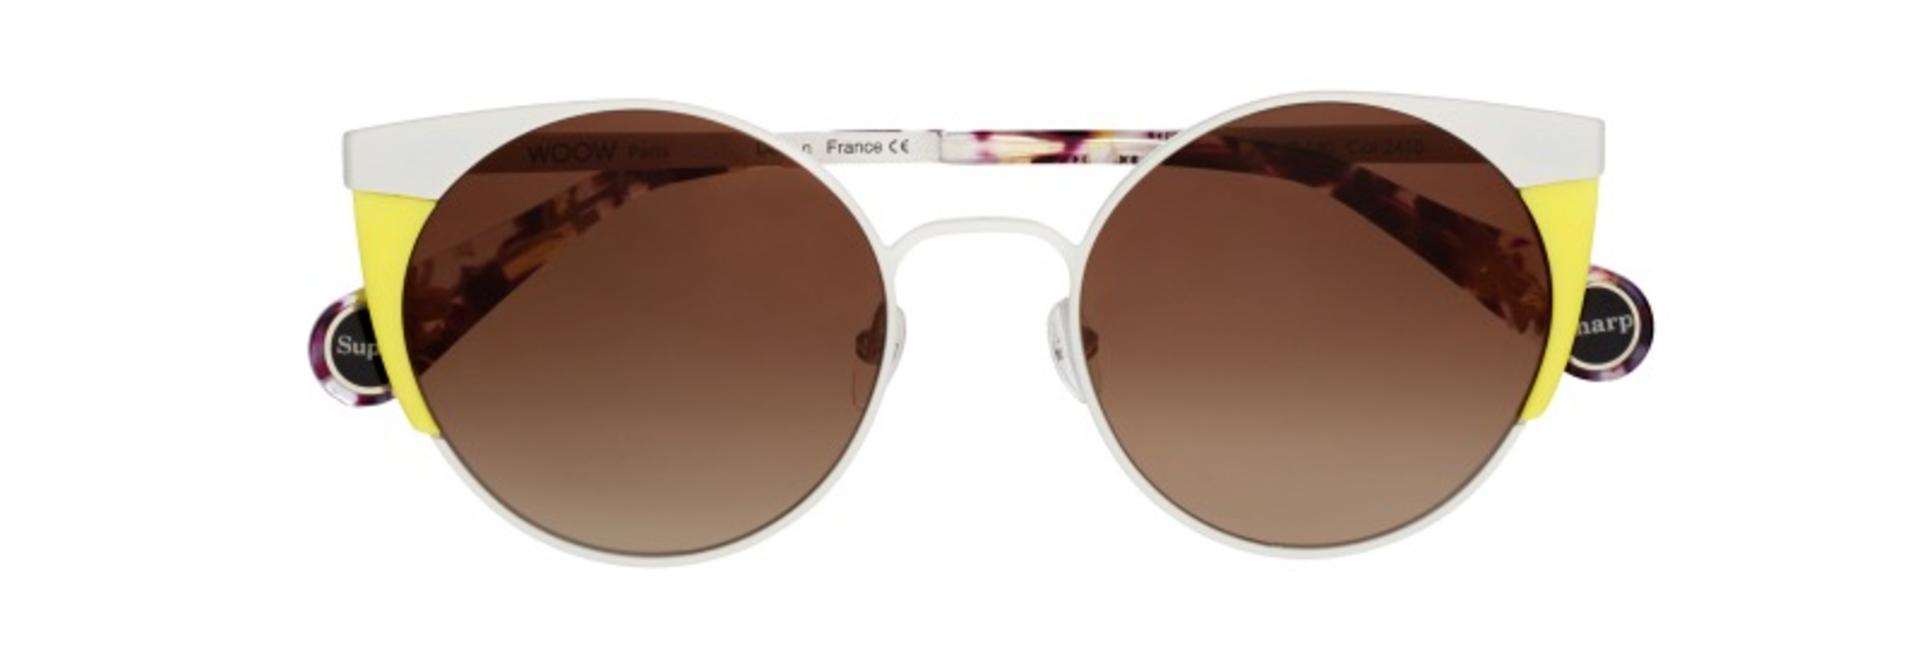 Super Sharp 2 by Woow Eyewear